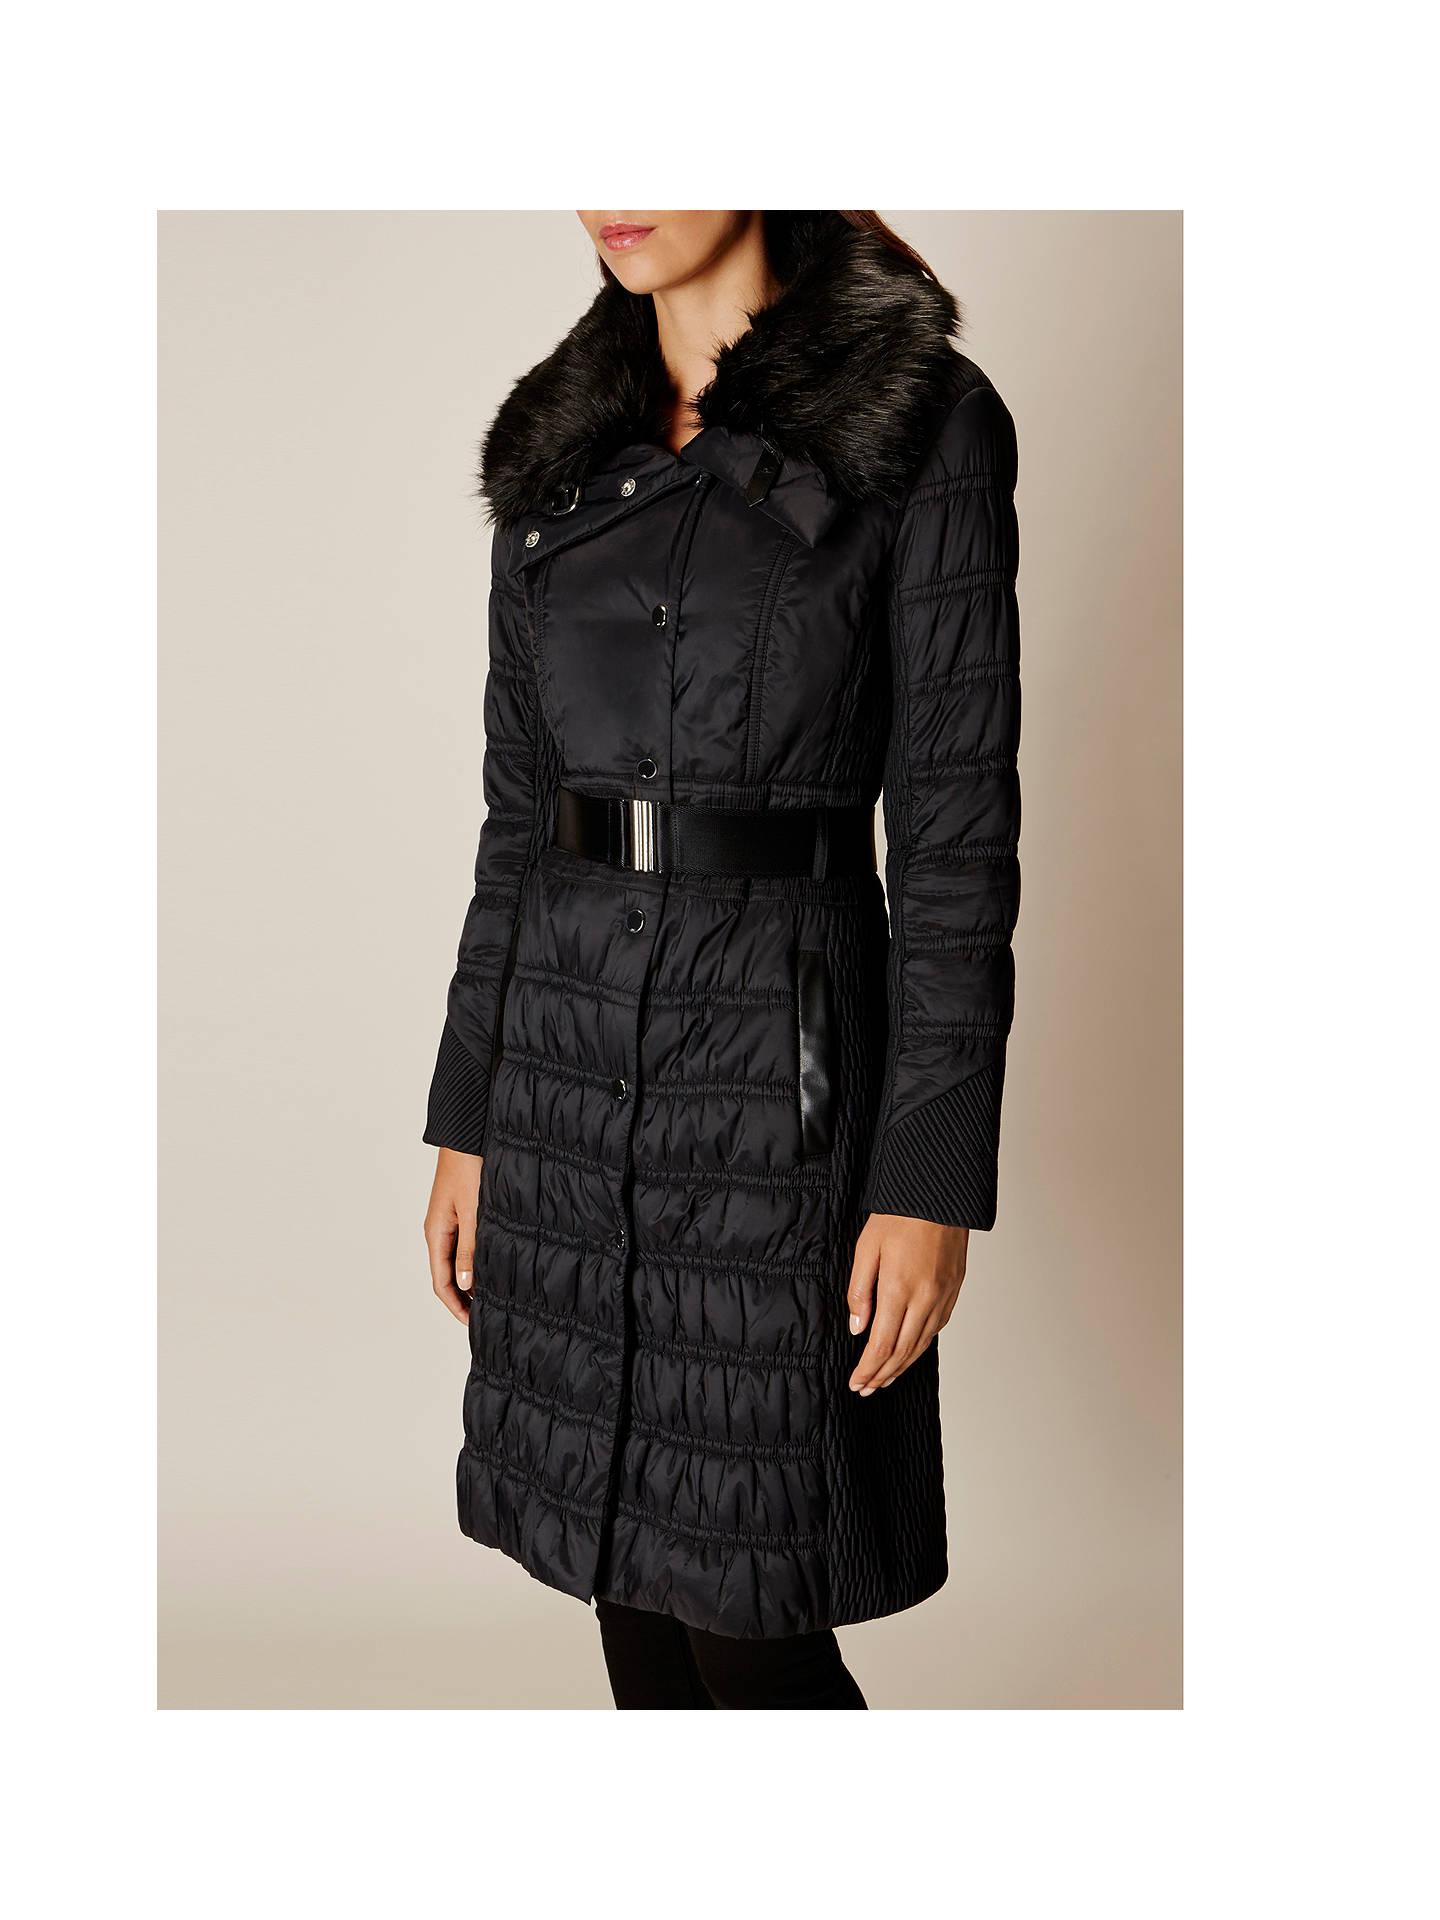 94c4f527ad ... Buy Karen Millen Lightweight Padded Coat, Black, 6 Online at  johnlewis.com ...